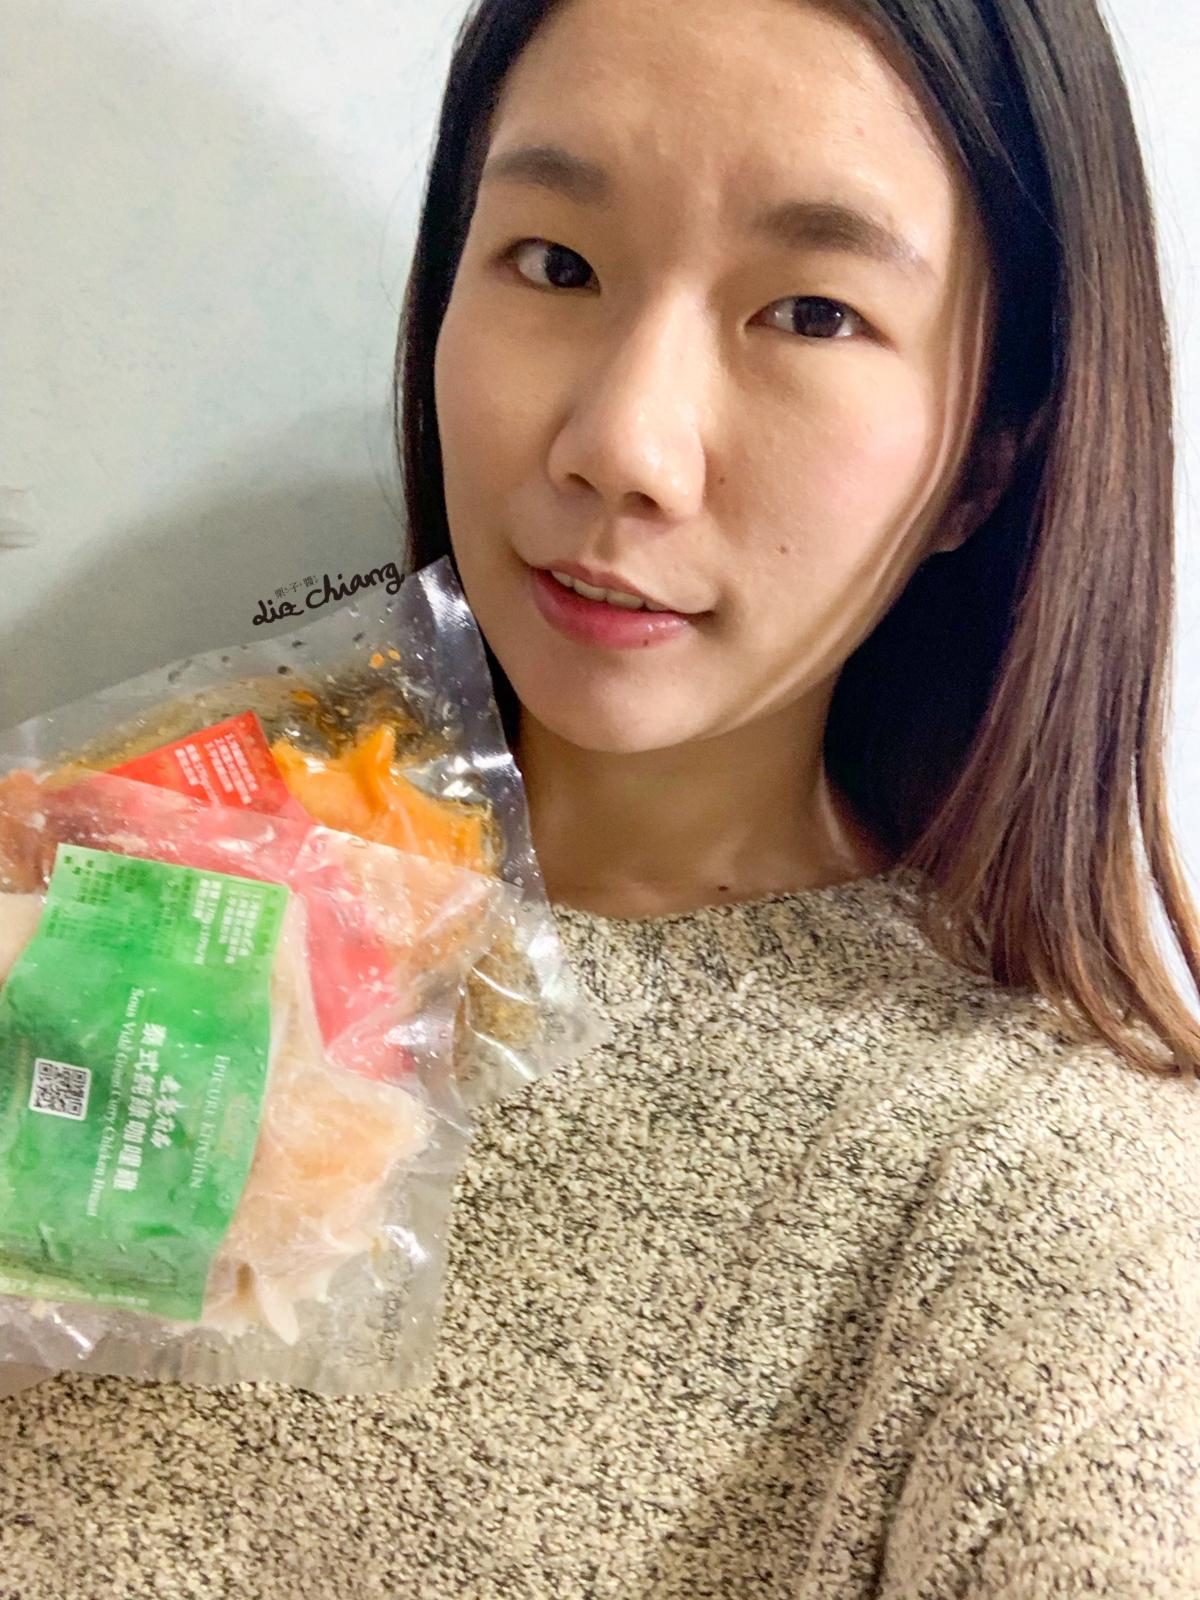 S__6234116Liz chiang 栗子醬-美食部落客-料理部落客